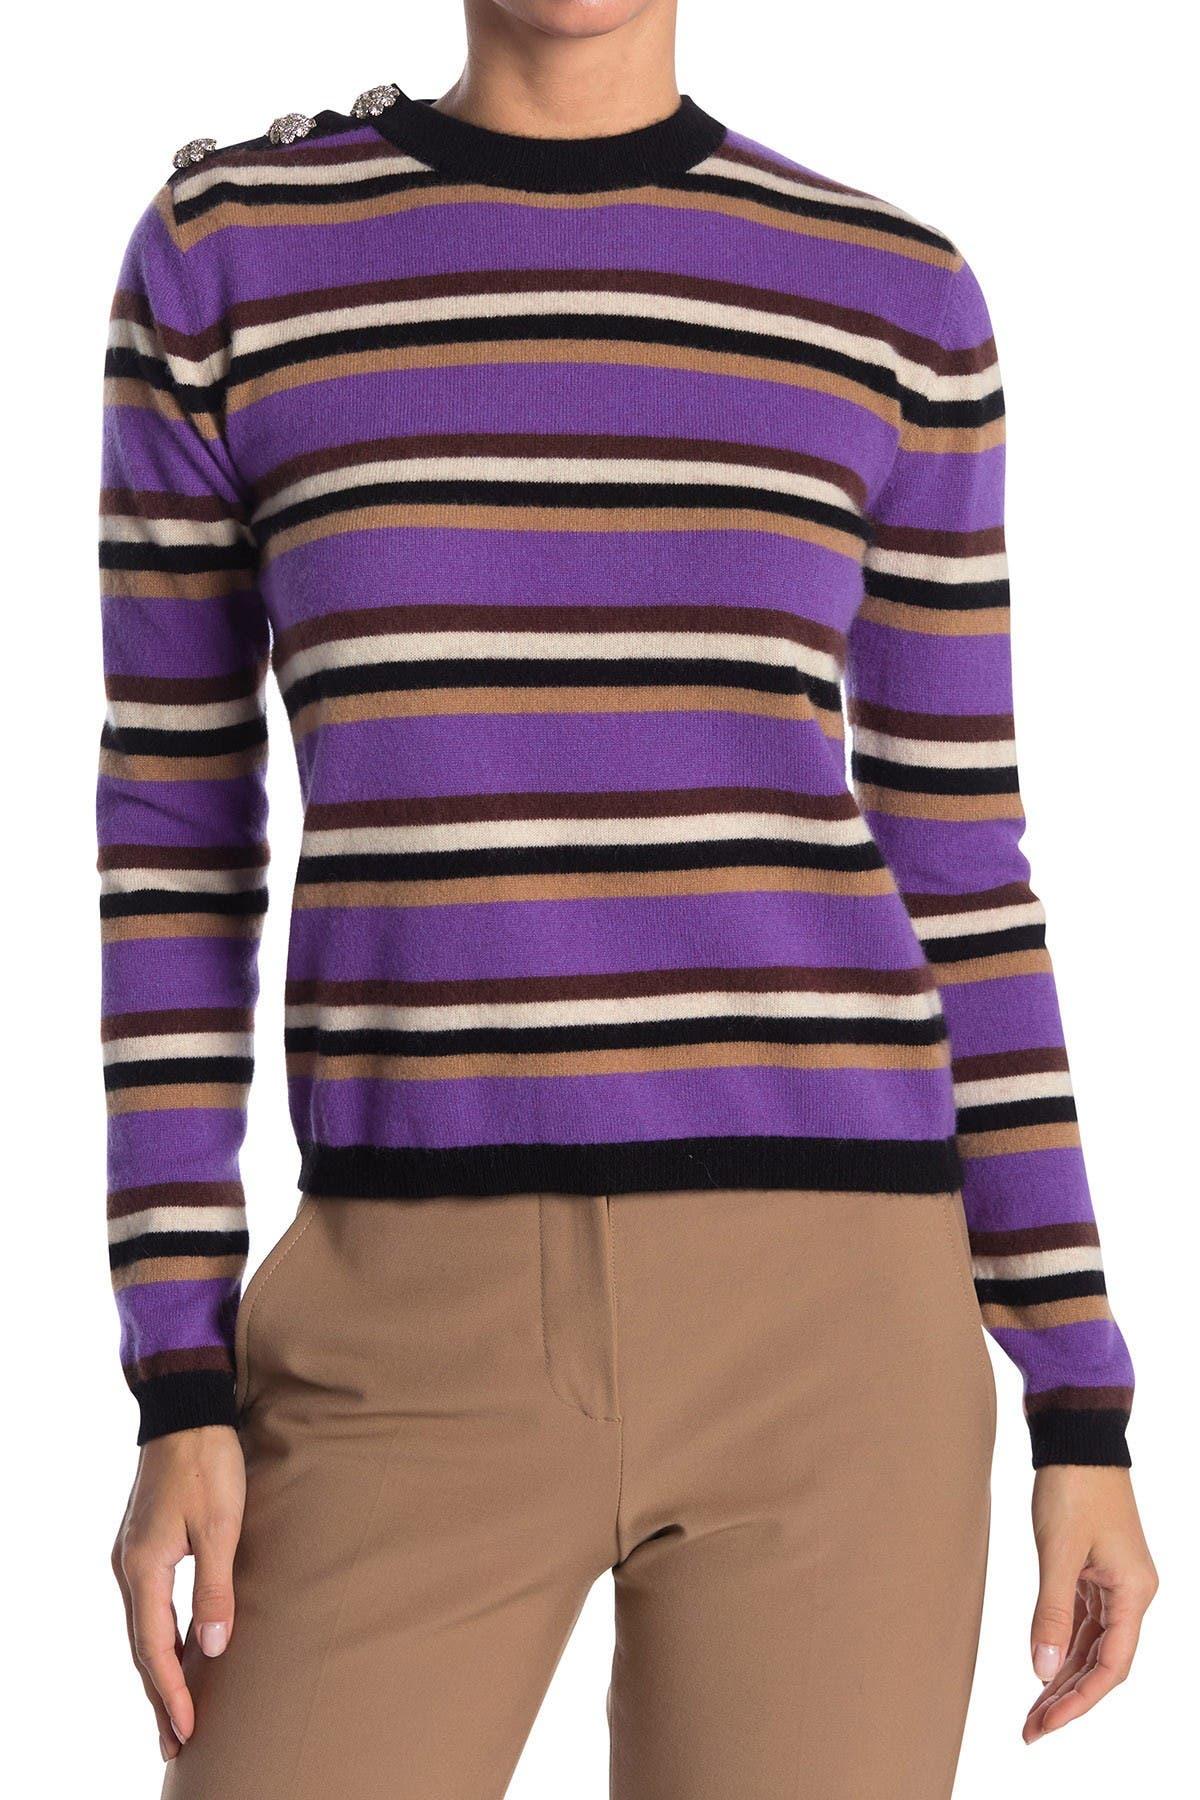 Image of GANNI Cashmere Knit Multicolor Button Pullover